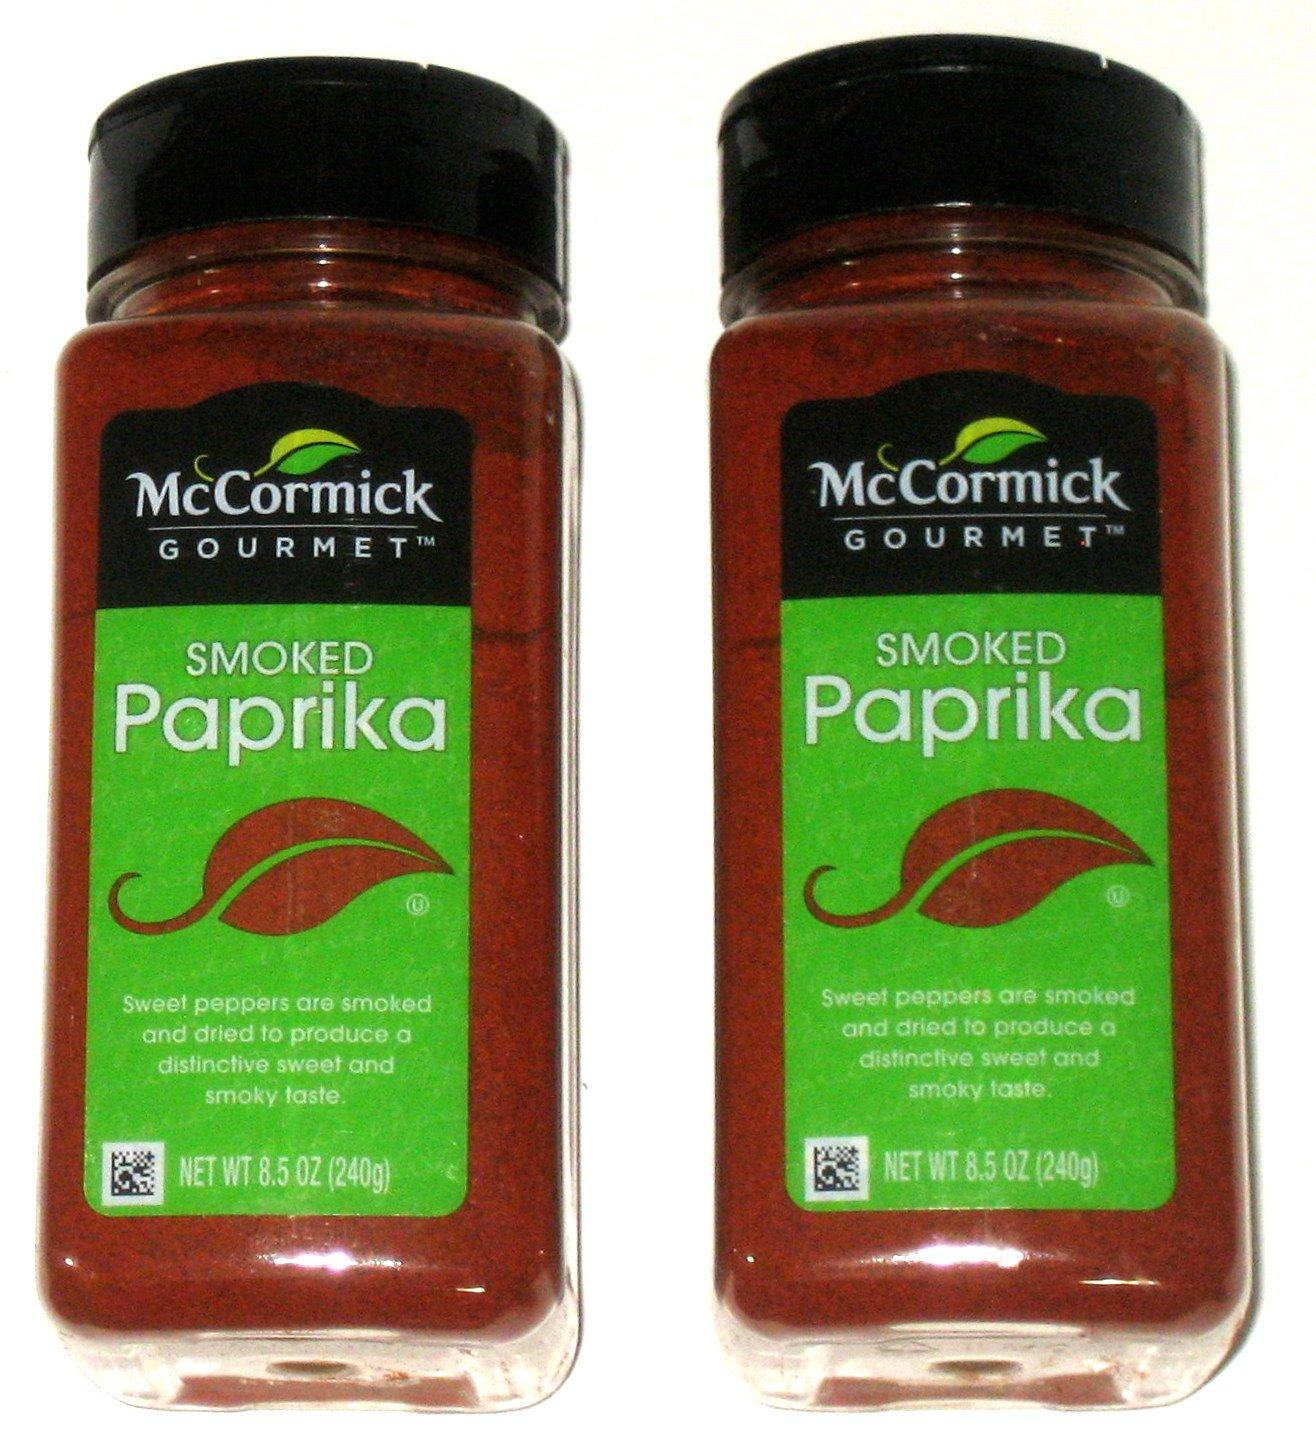 Indefinitely McCormick Gourmet SMOKED overseas PAPRIKA 8.5oz 2 Pack